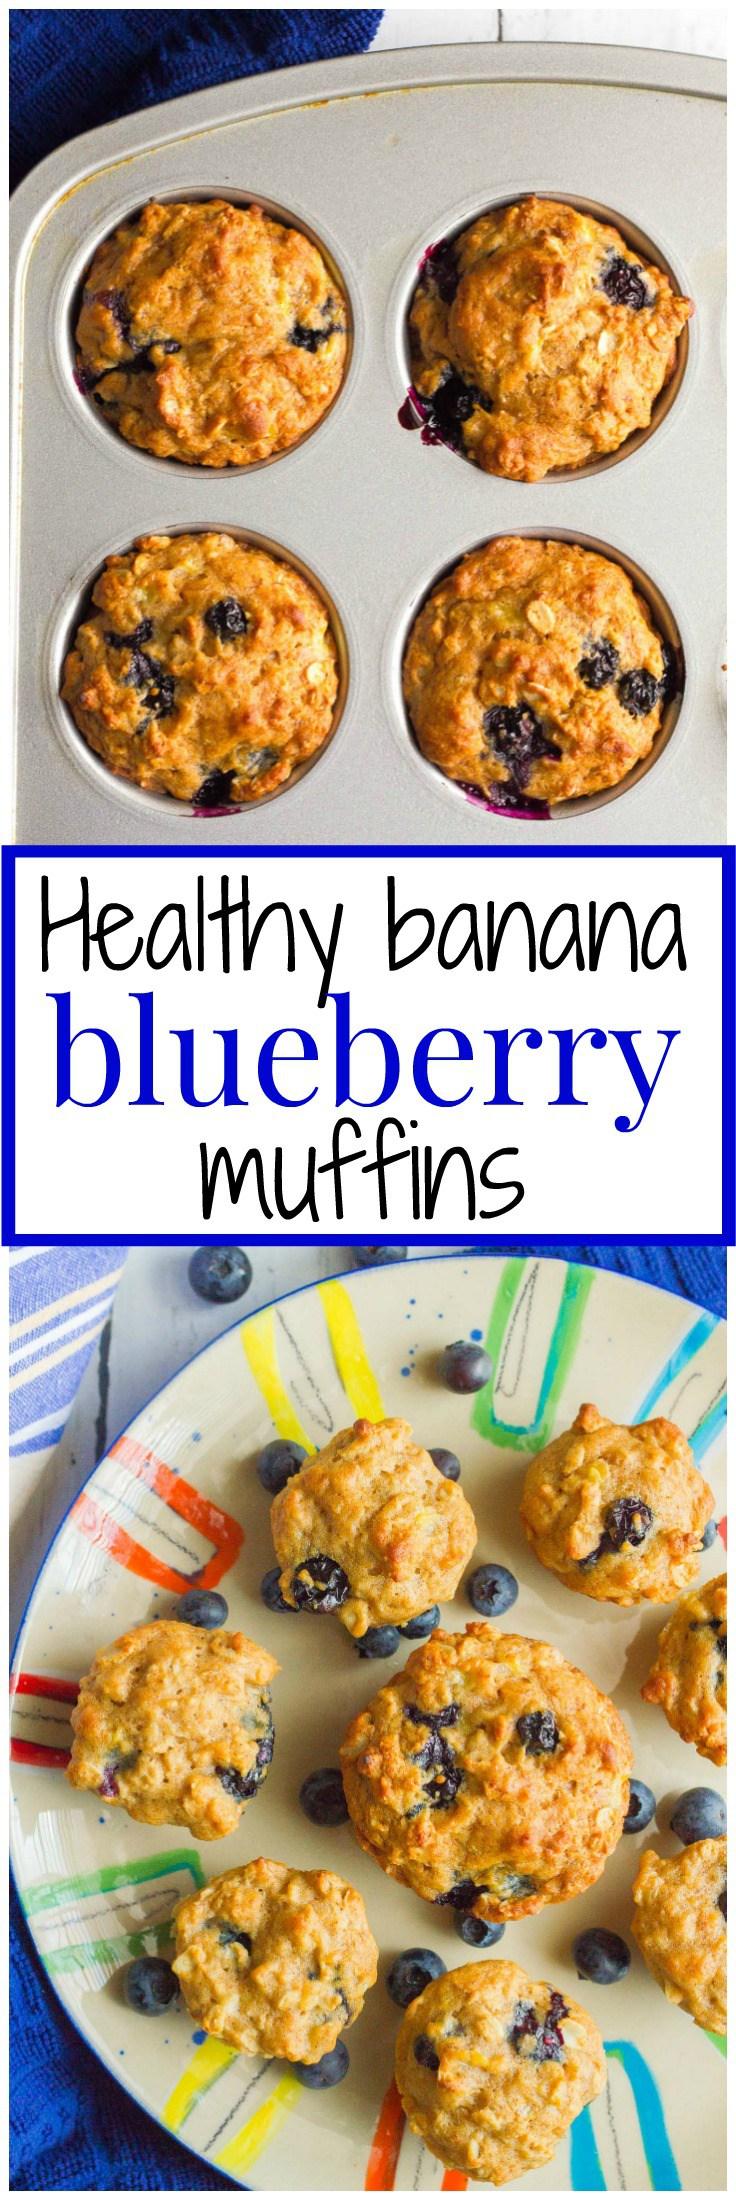 Pinterest Blueberry Recipe Image